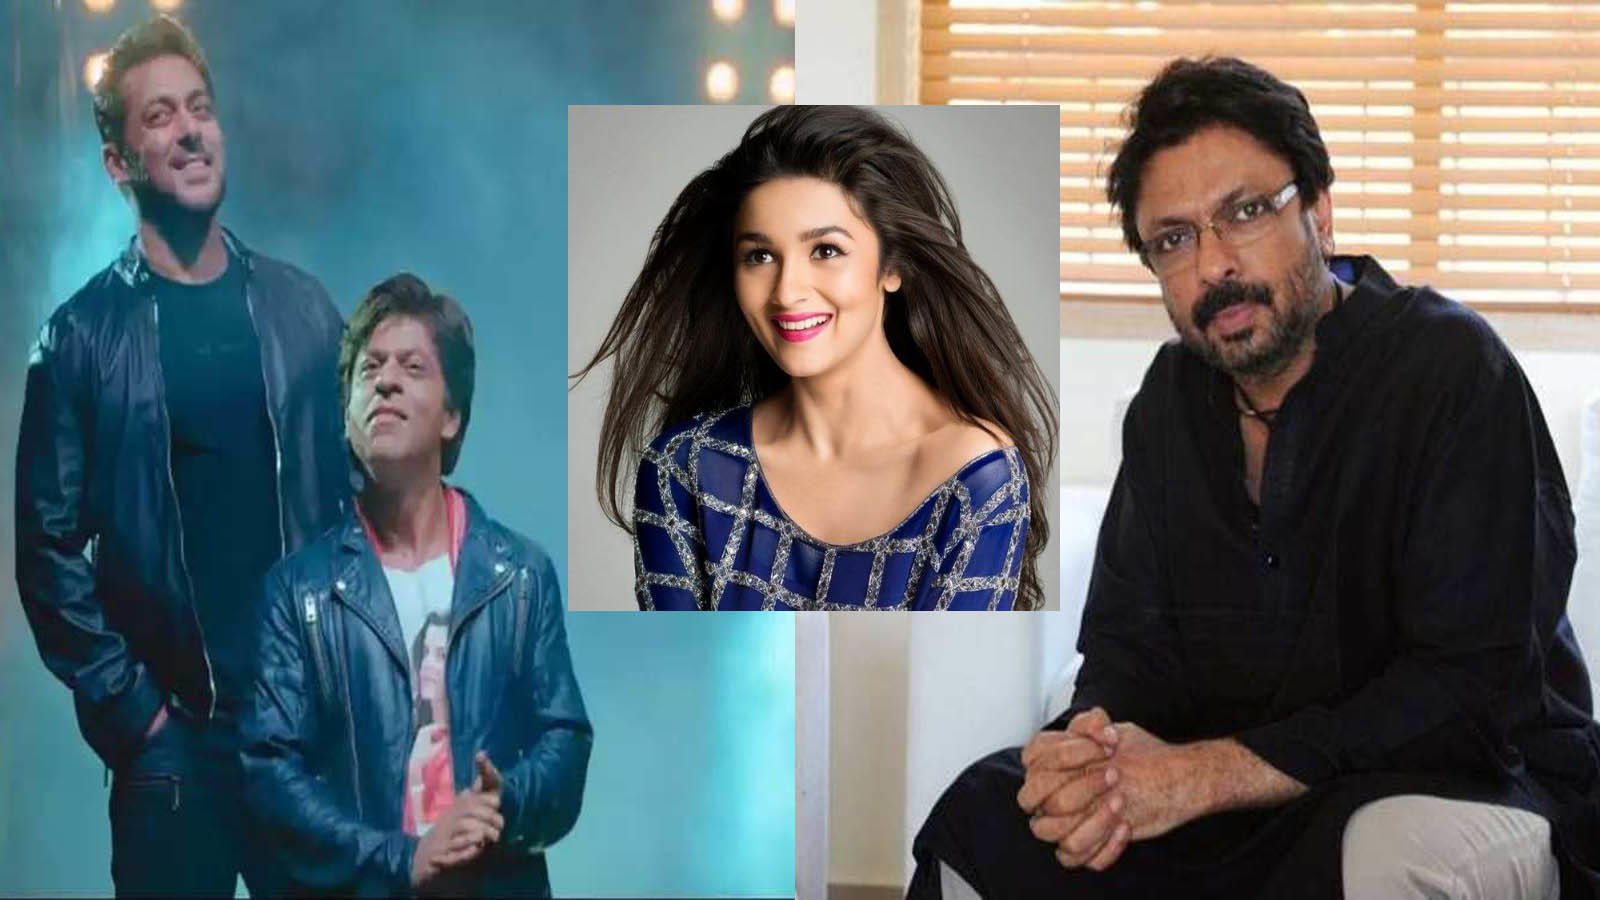 Alia Bhatt to star with Salman Khan and Shahrukh Khan in Sanjay Leela Bhansali's next?